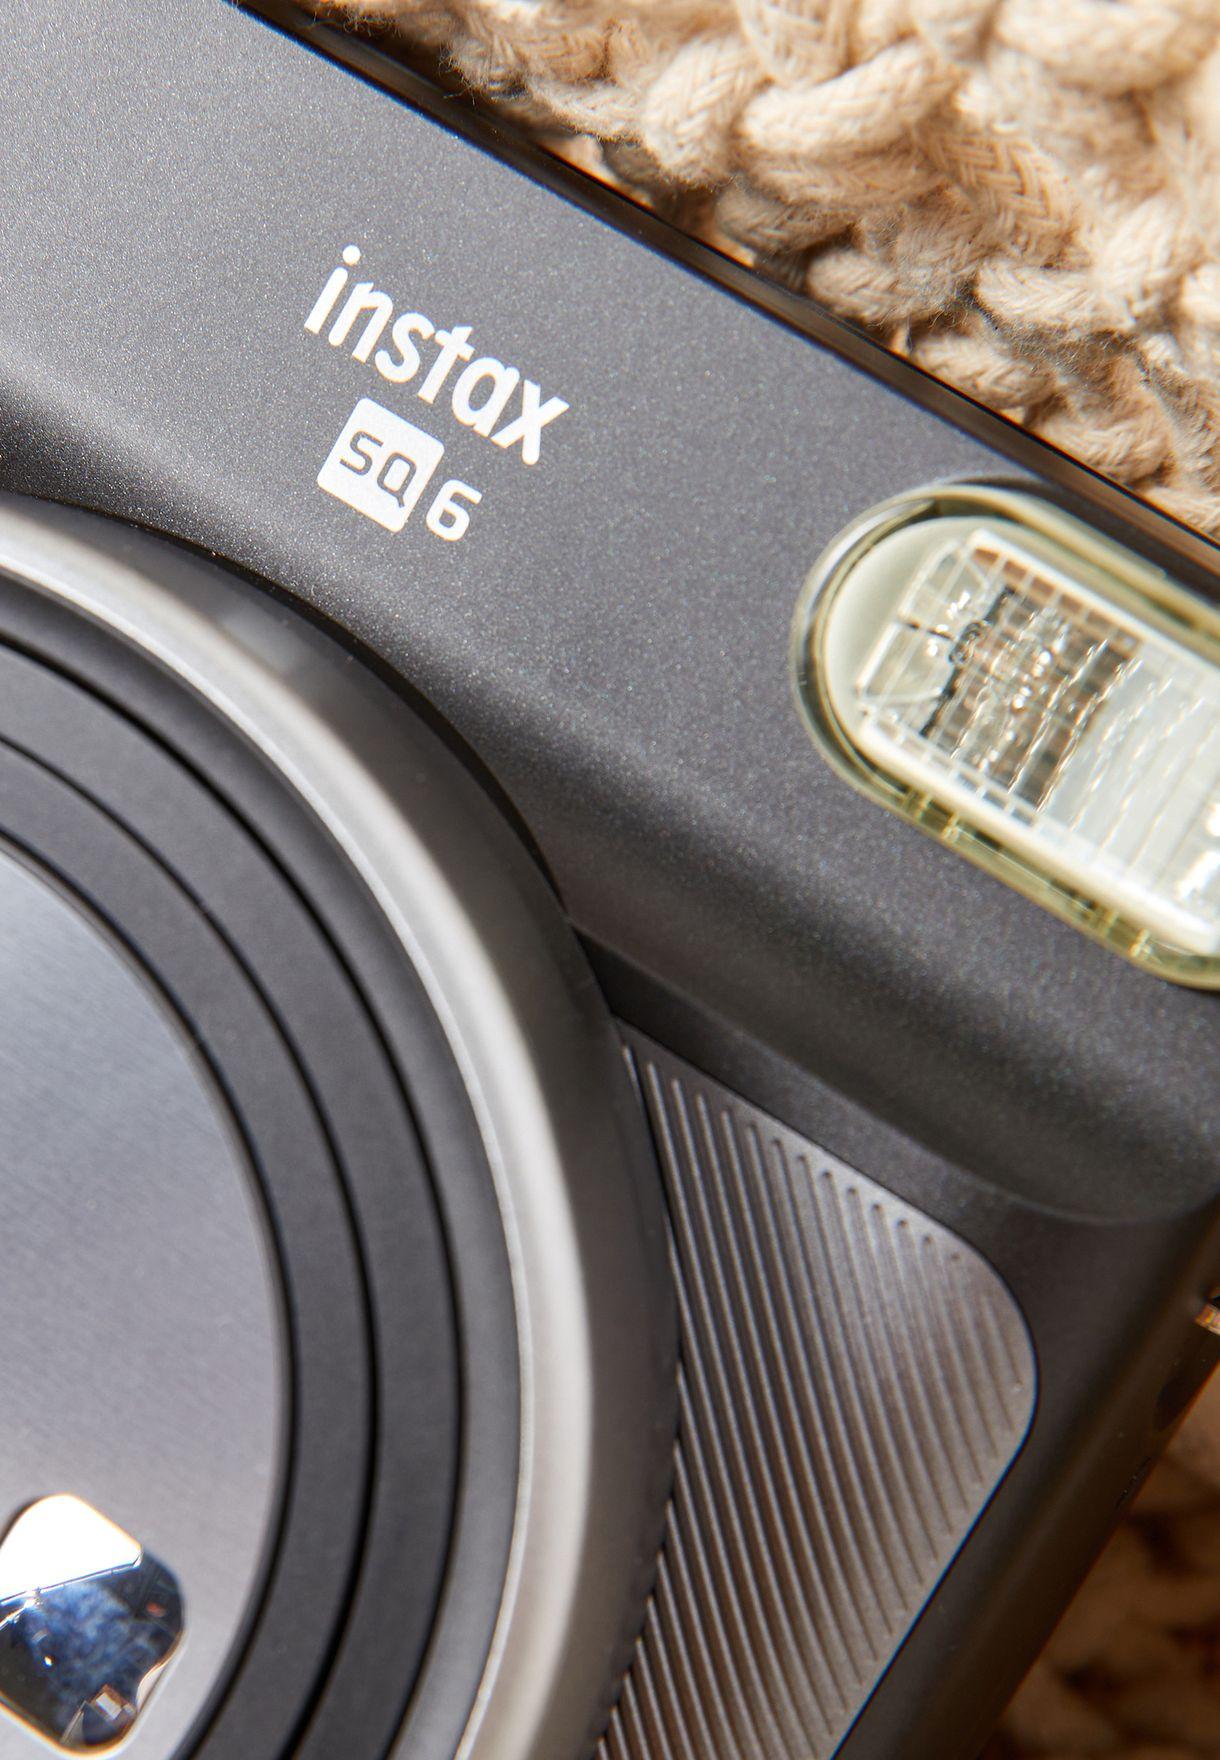 Instax SQ6 Square Camera + Case